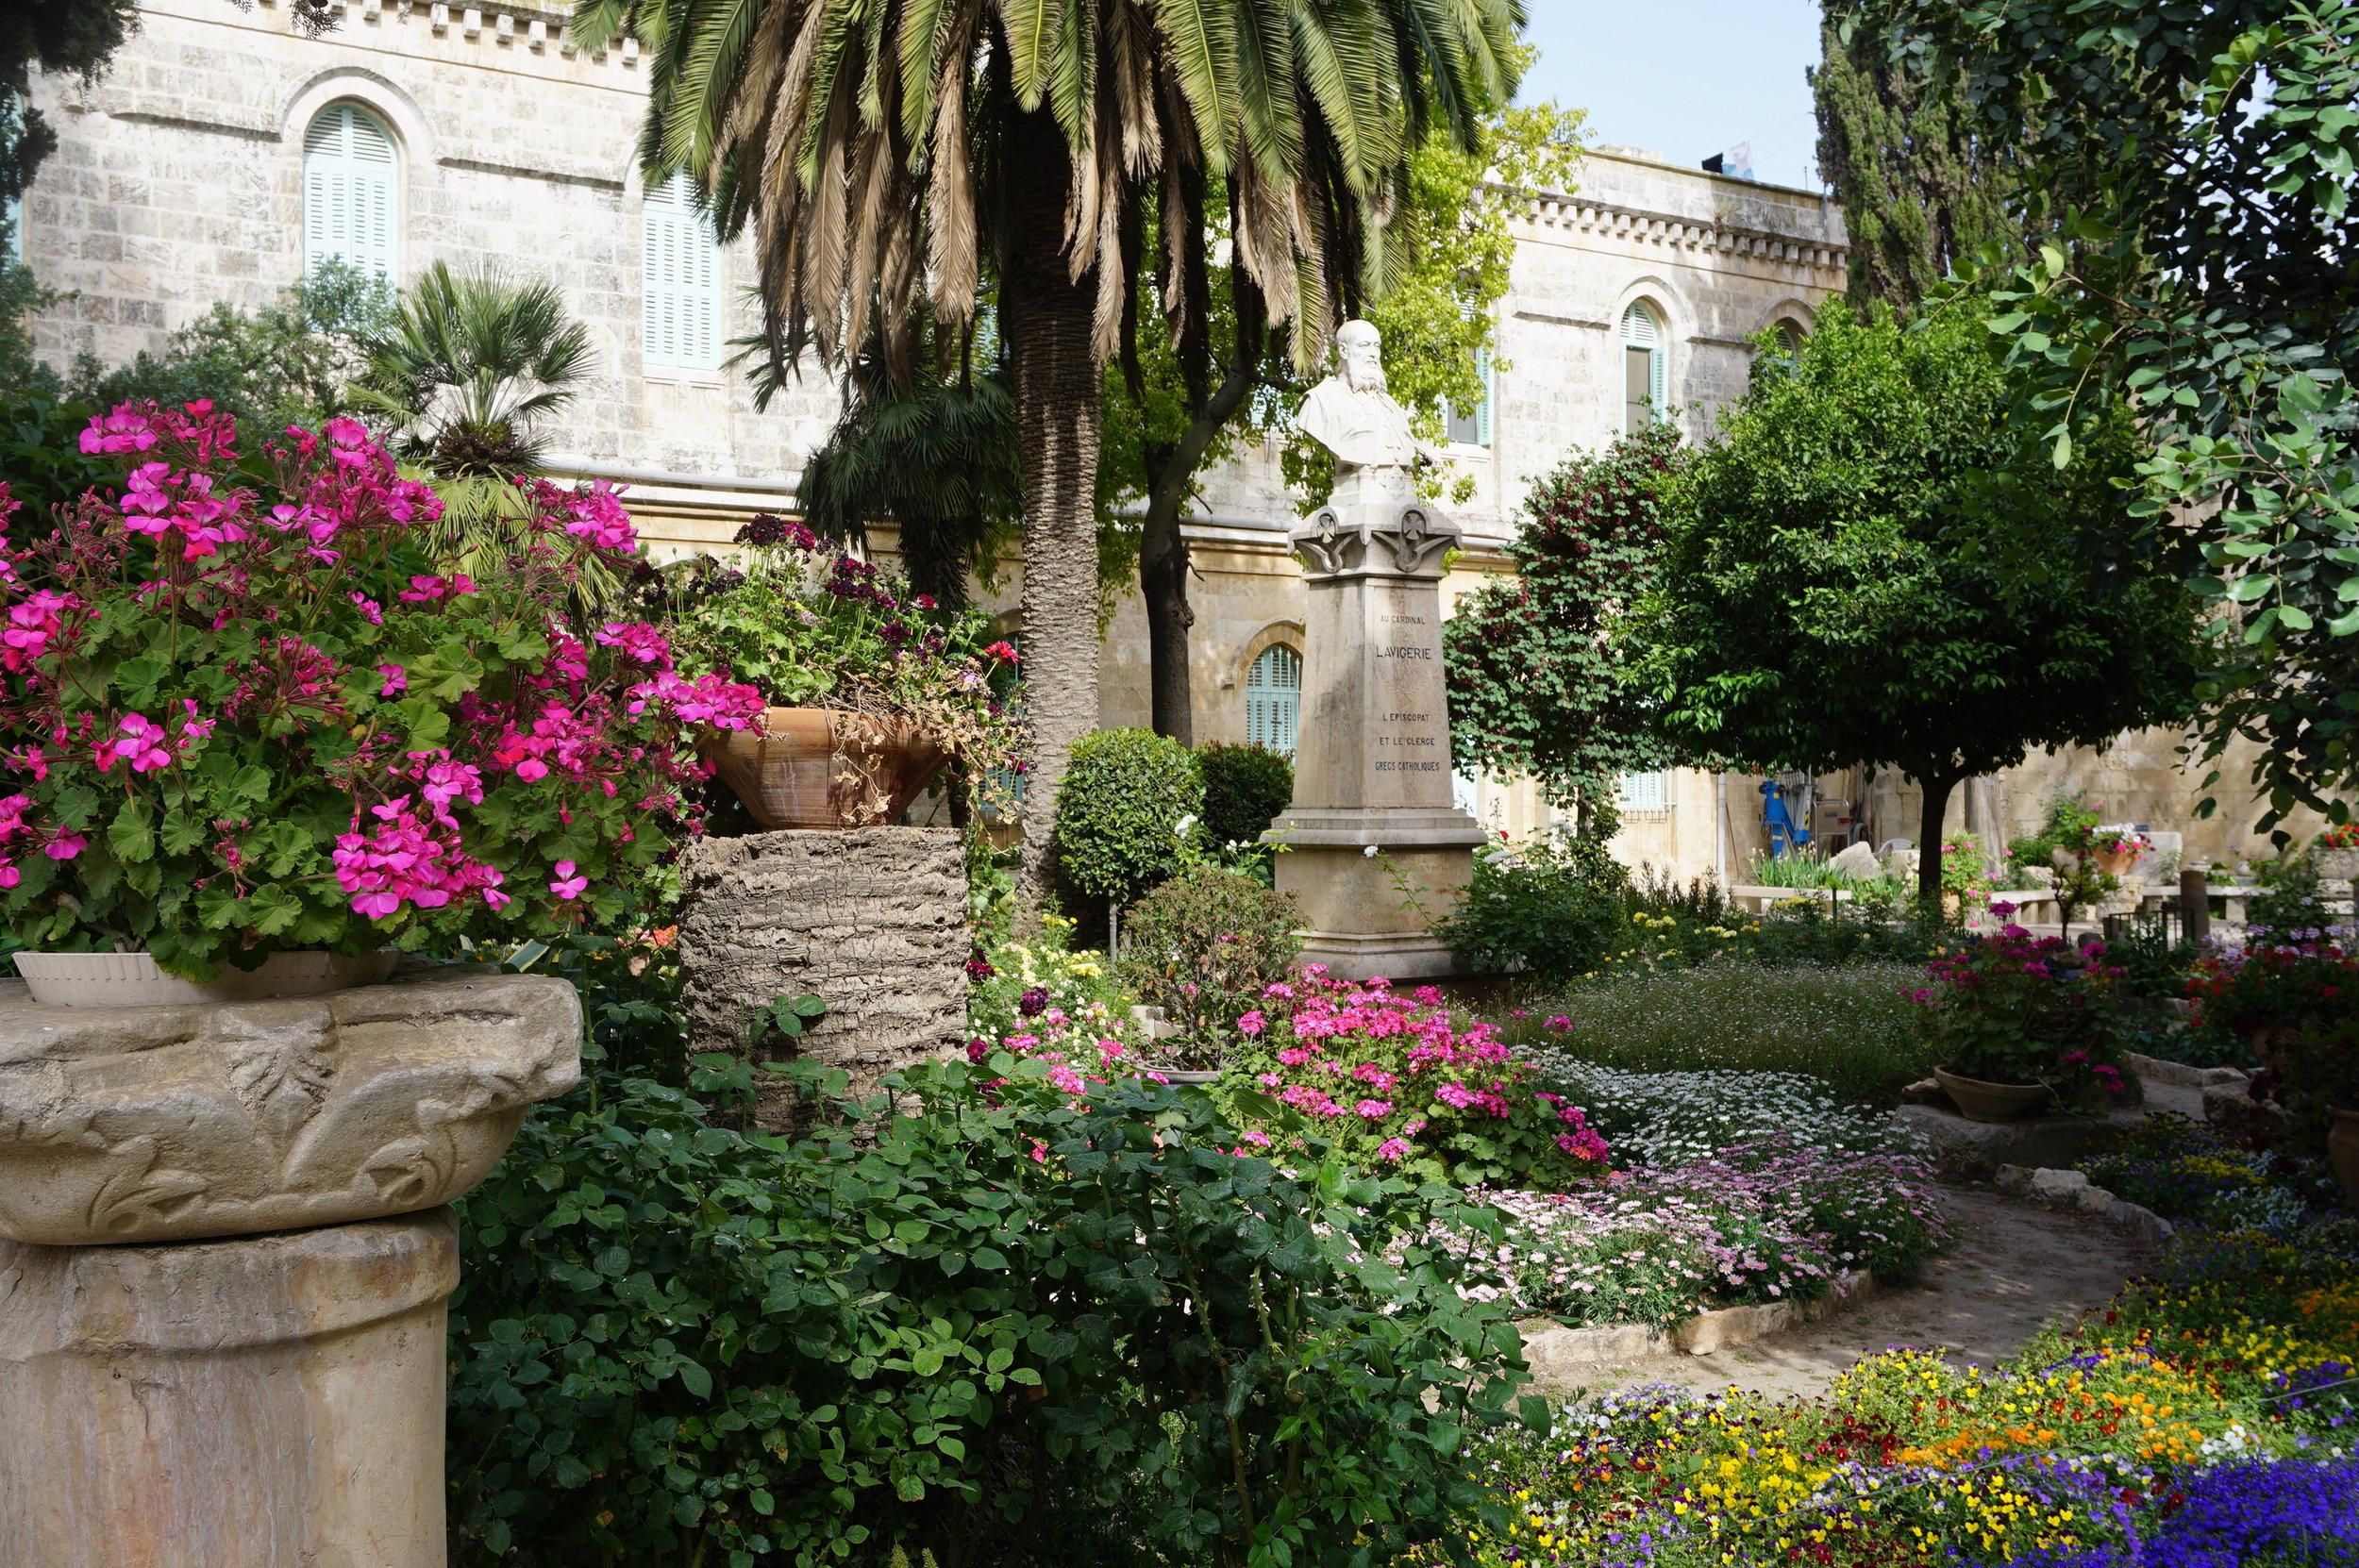 Gardens at Pool of Bethesda.JPG